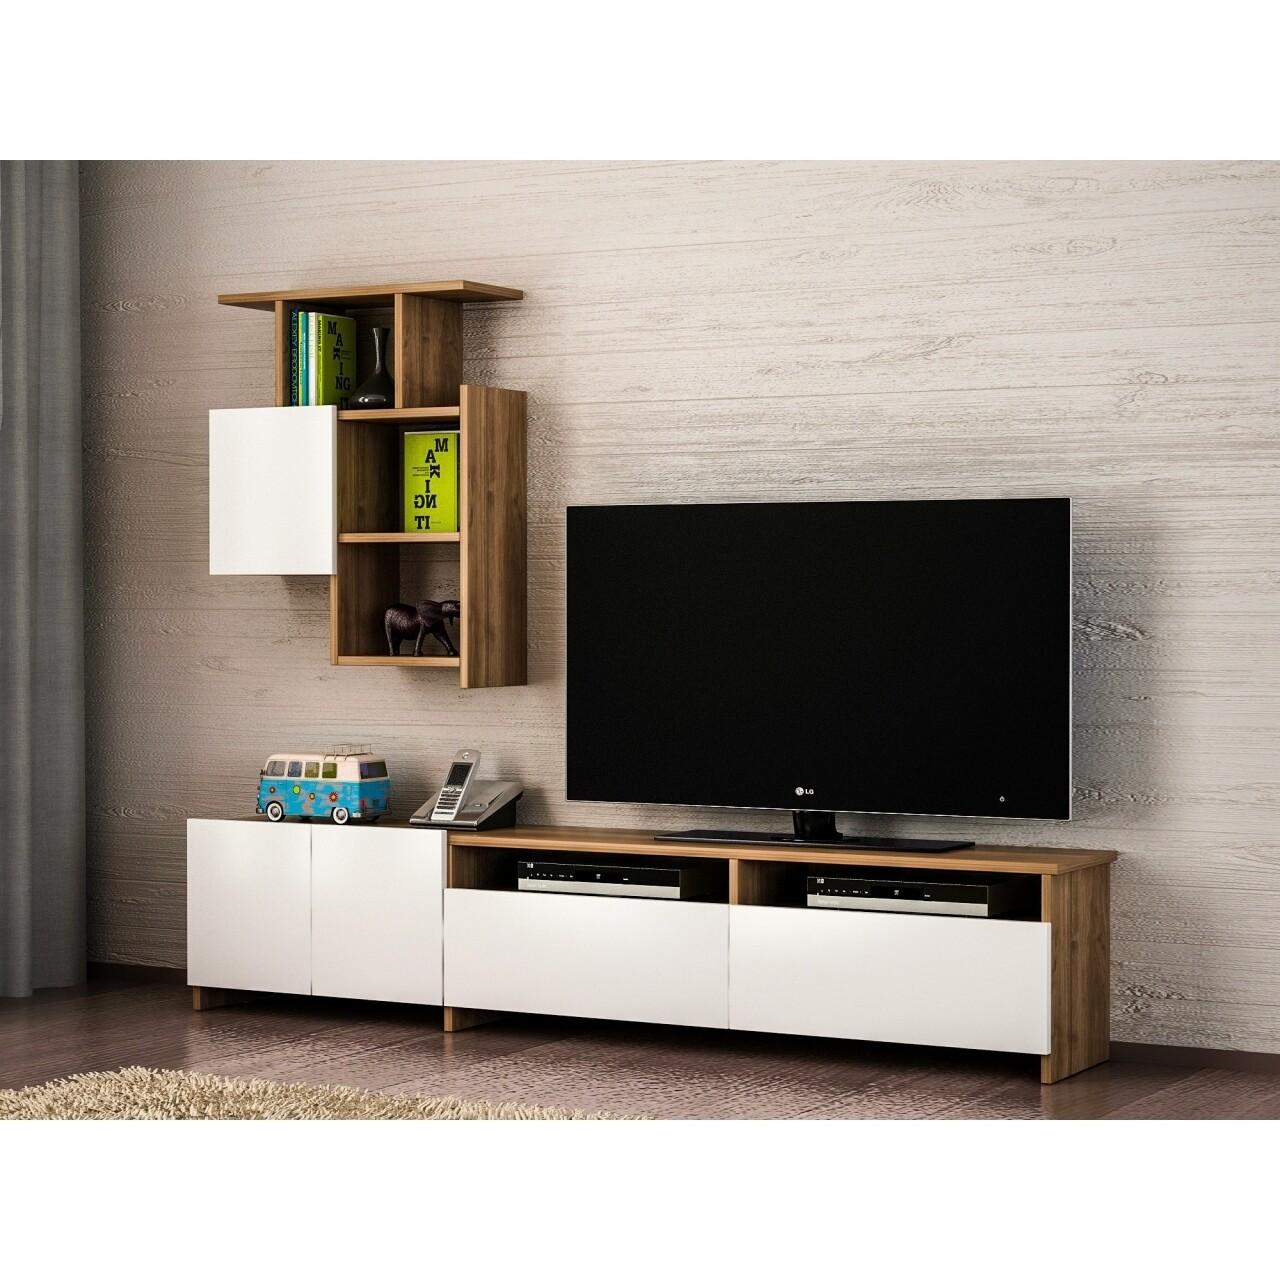 Comoda TV cu raft, Wooden Art, Mariposa Walnut White, 180x37x31.5 cm